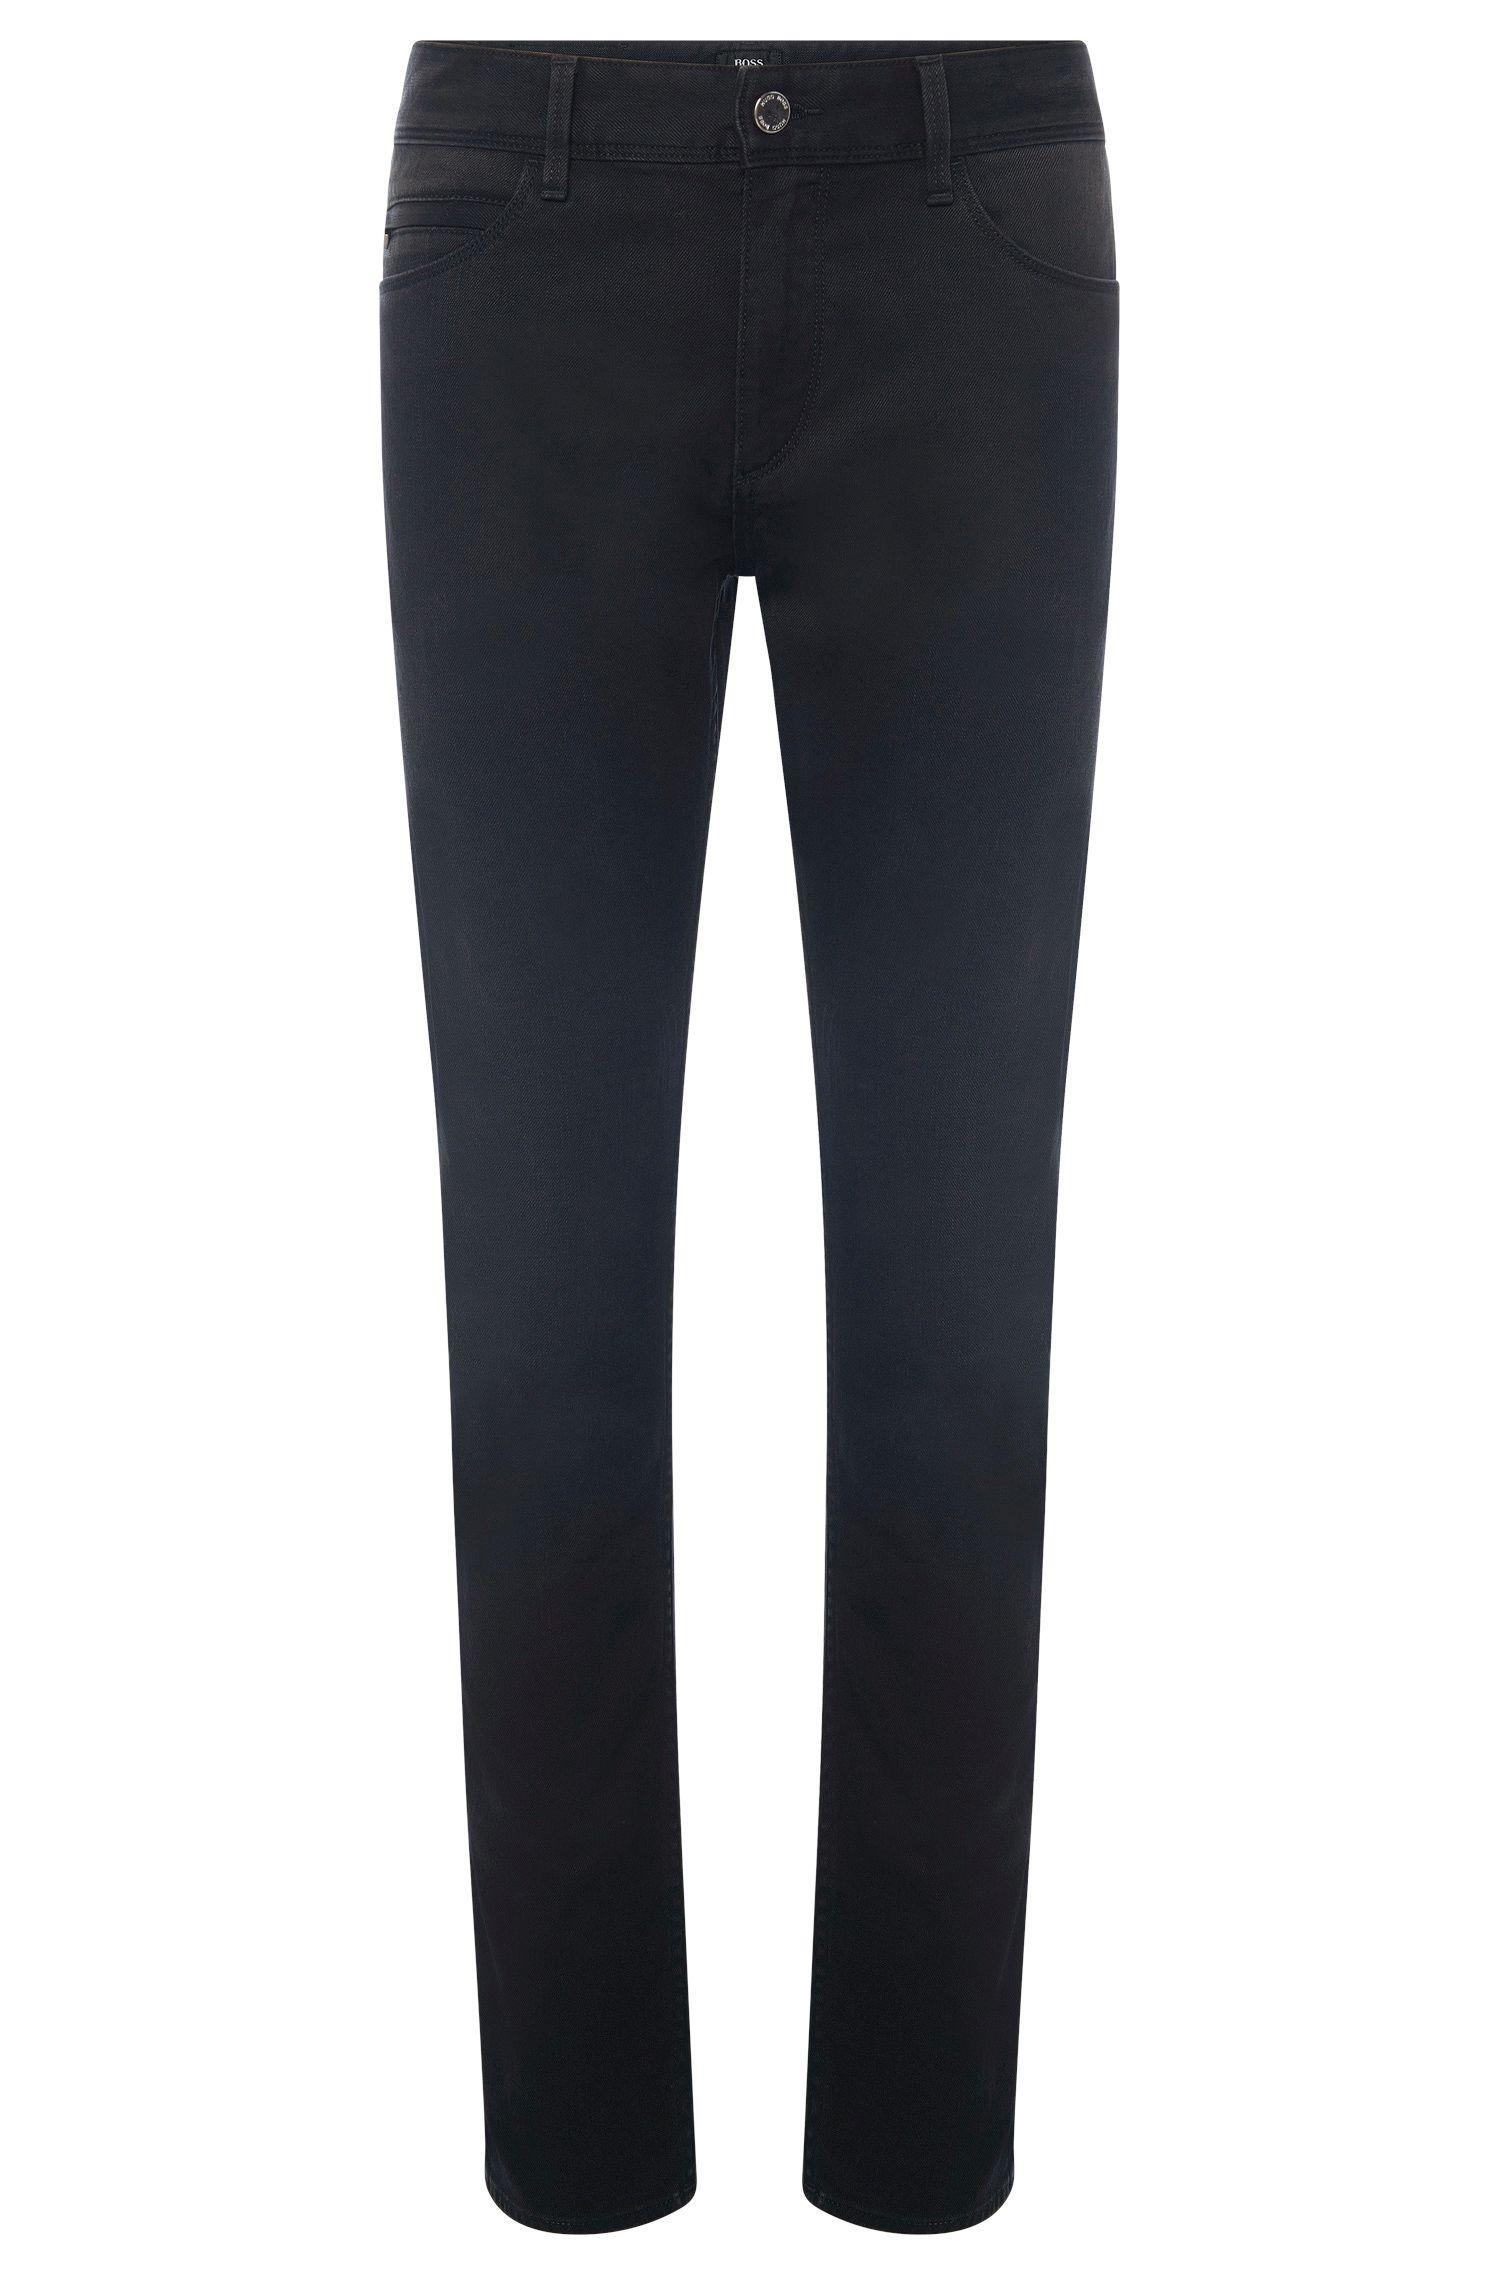 'Delaware' | Slim Fit, 10 oz Stretch Cotton Jeans